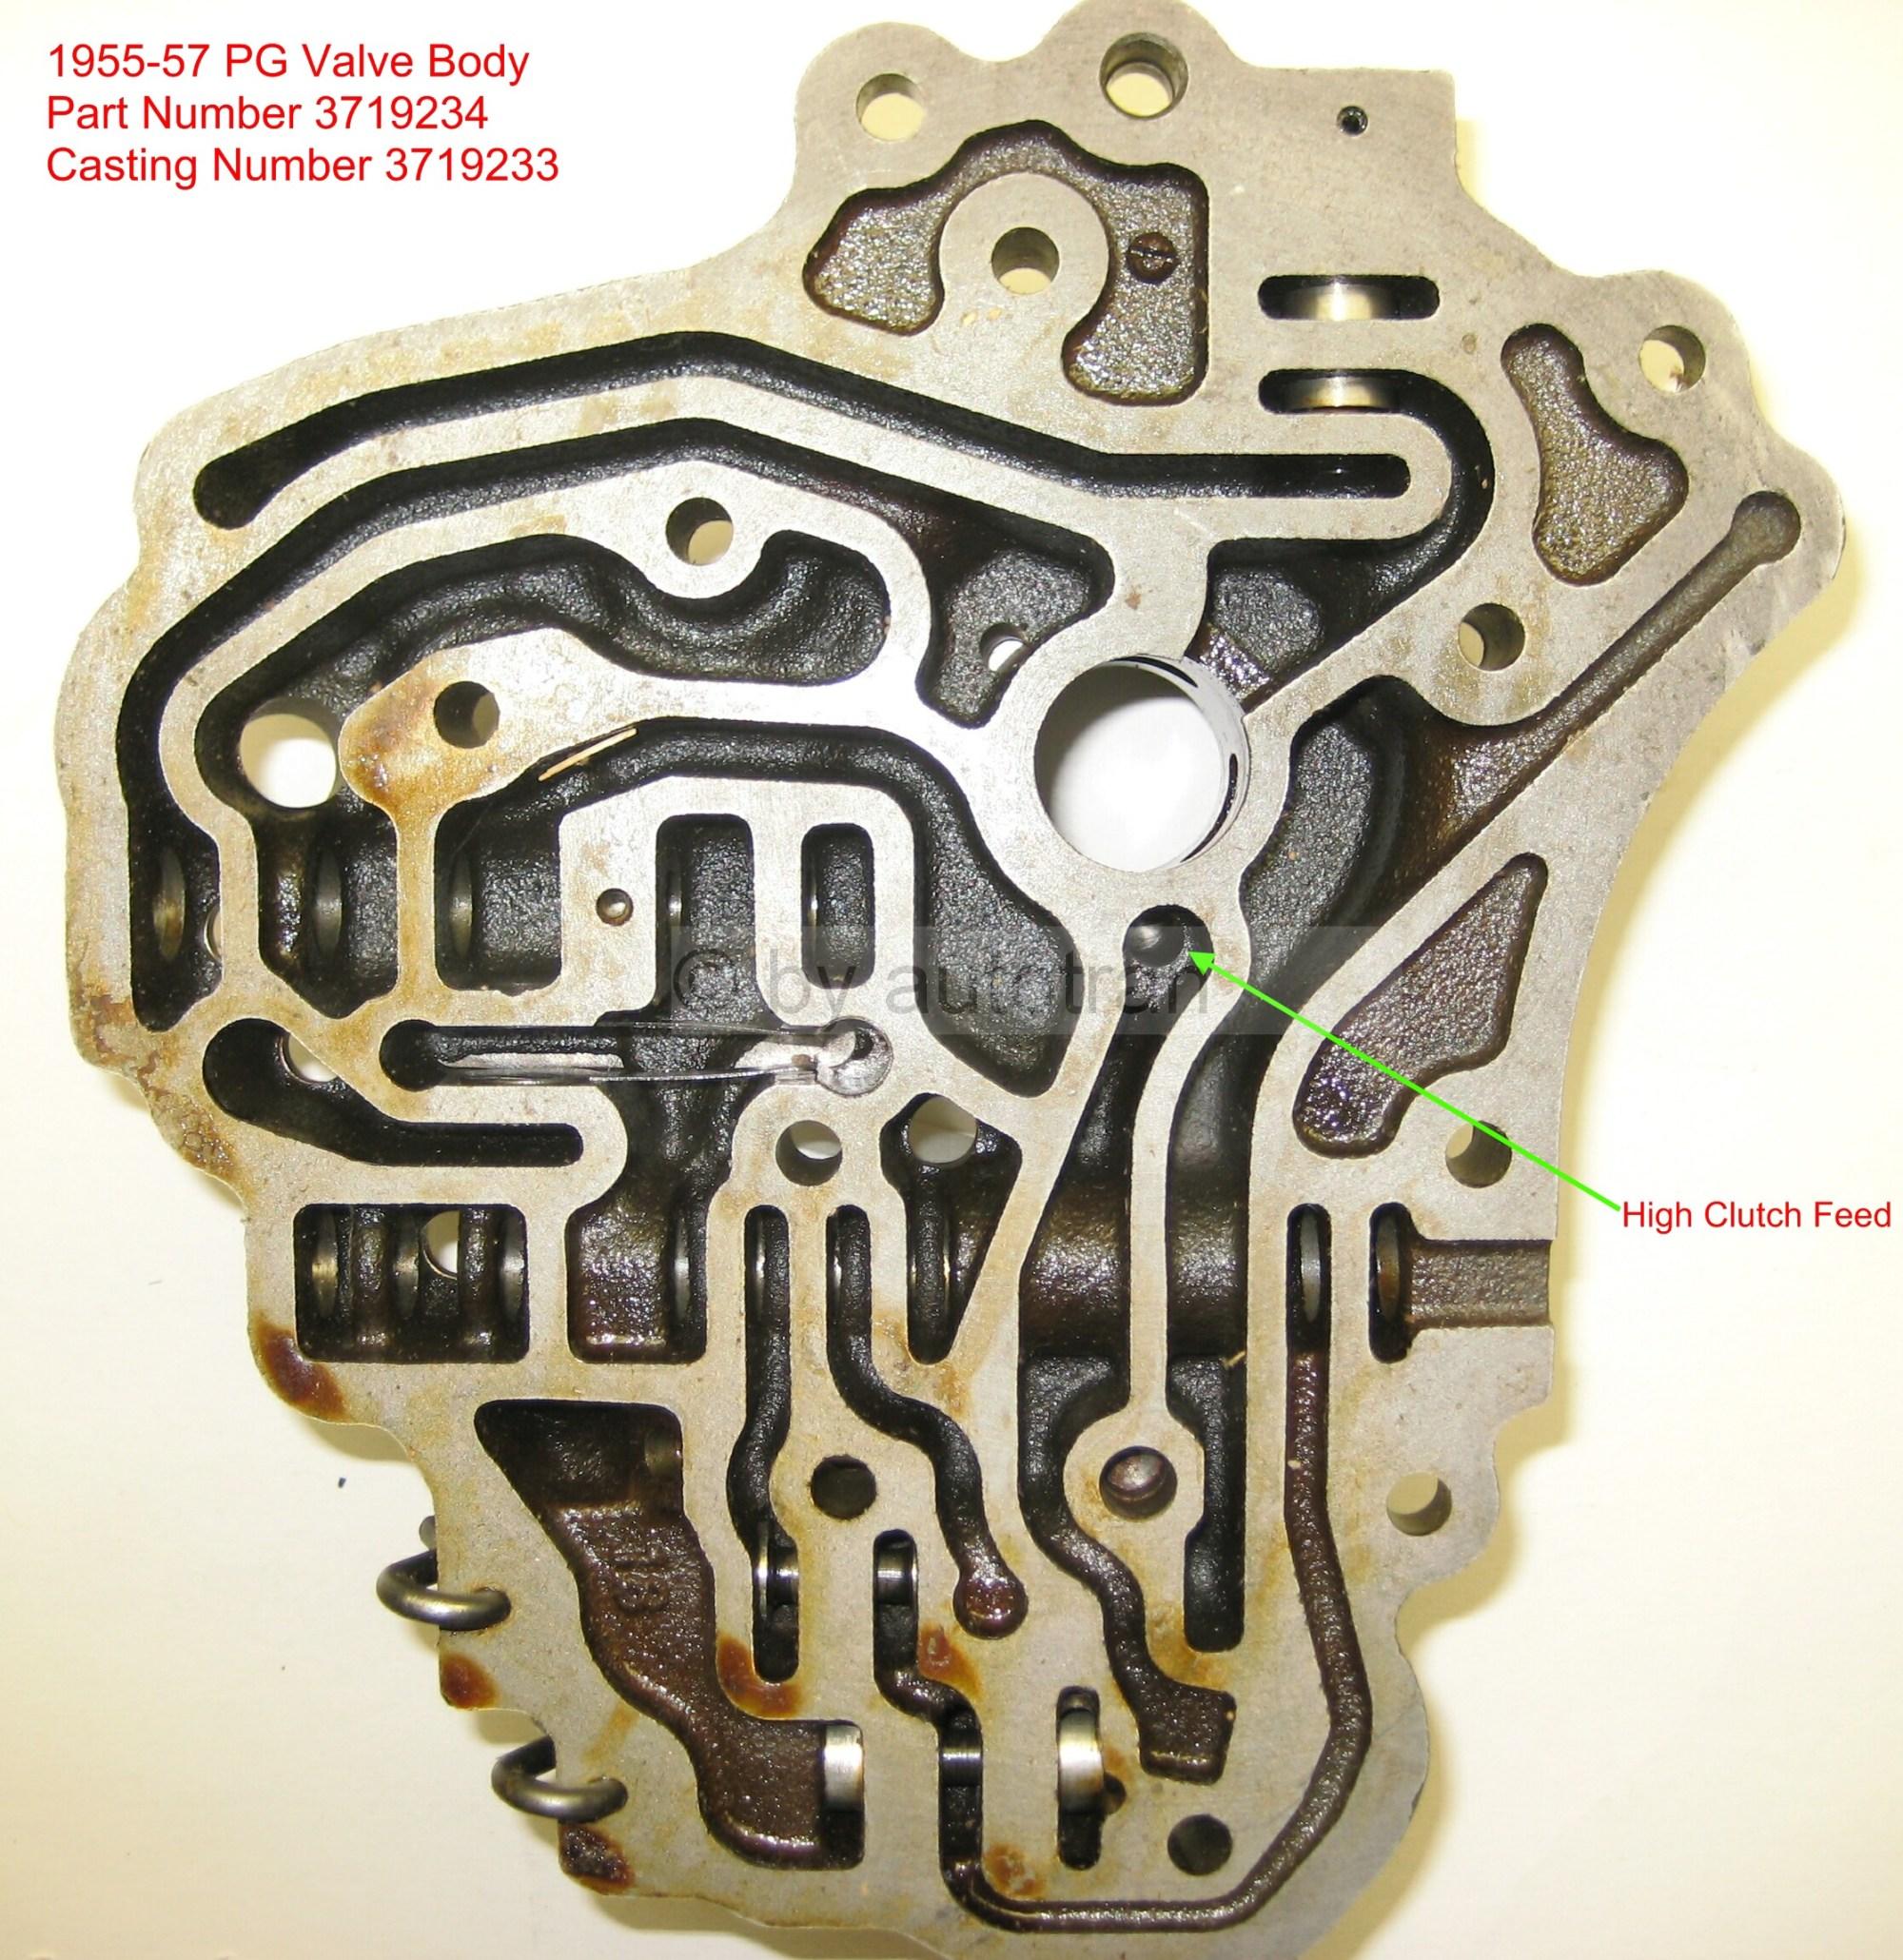 hight resolution of 1955 57 valve body back p n 3719234 casting 3719233